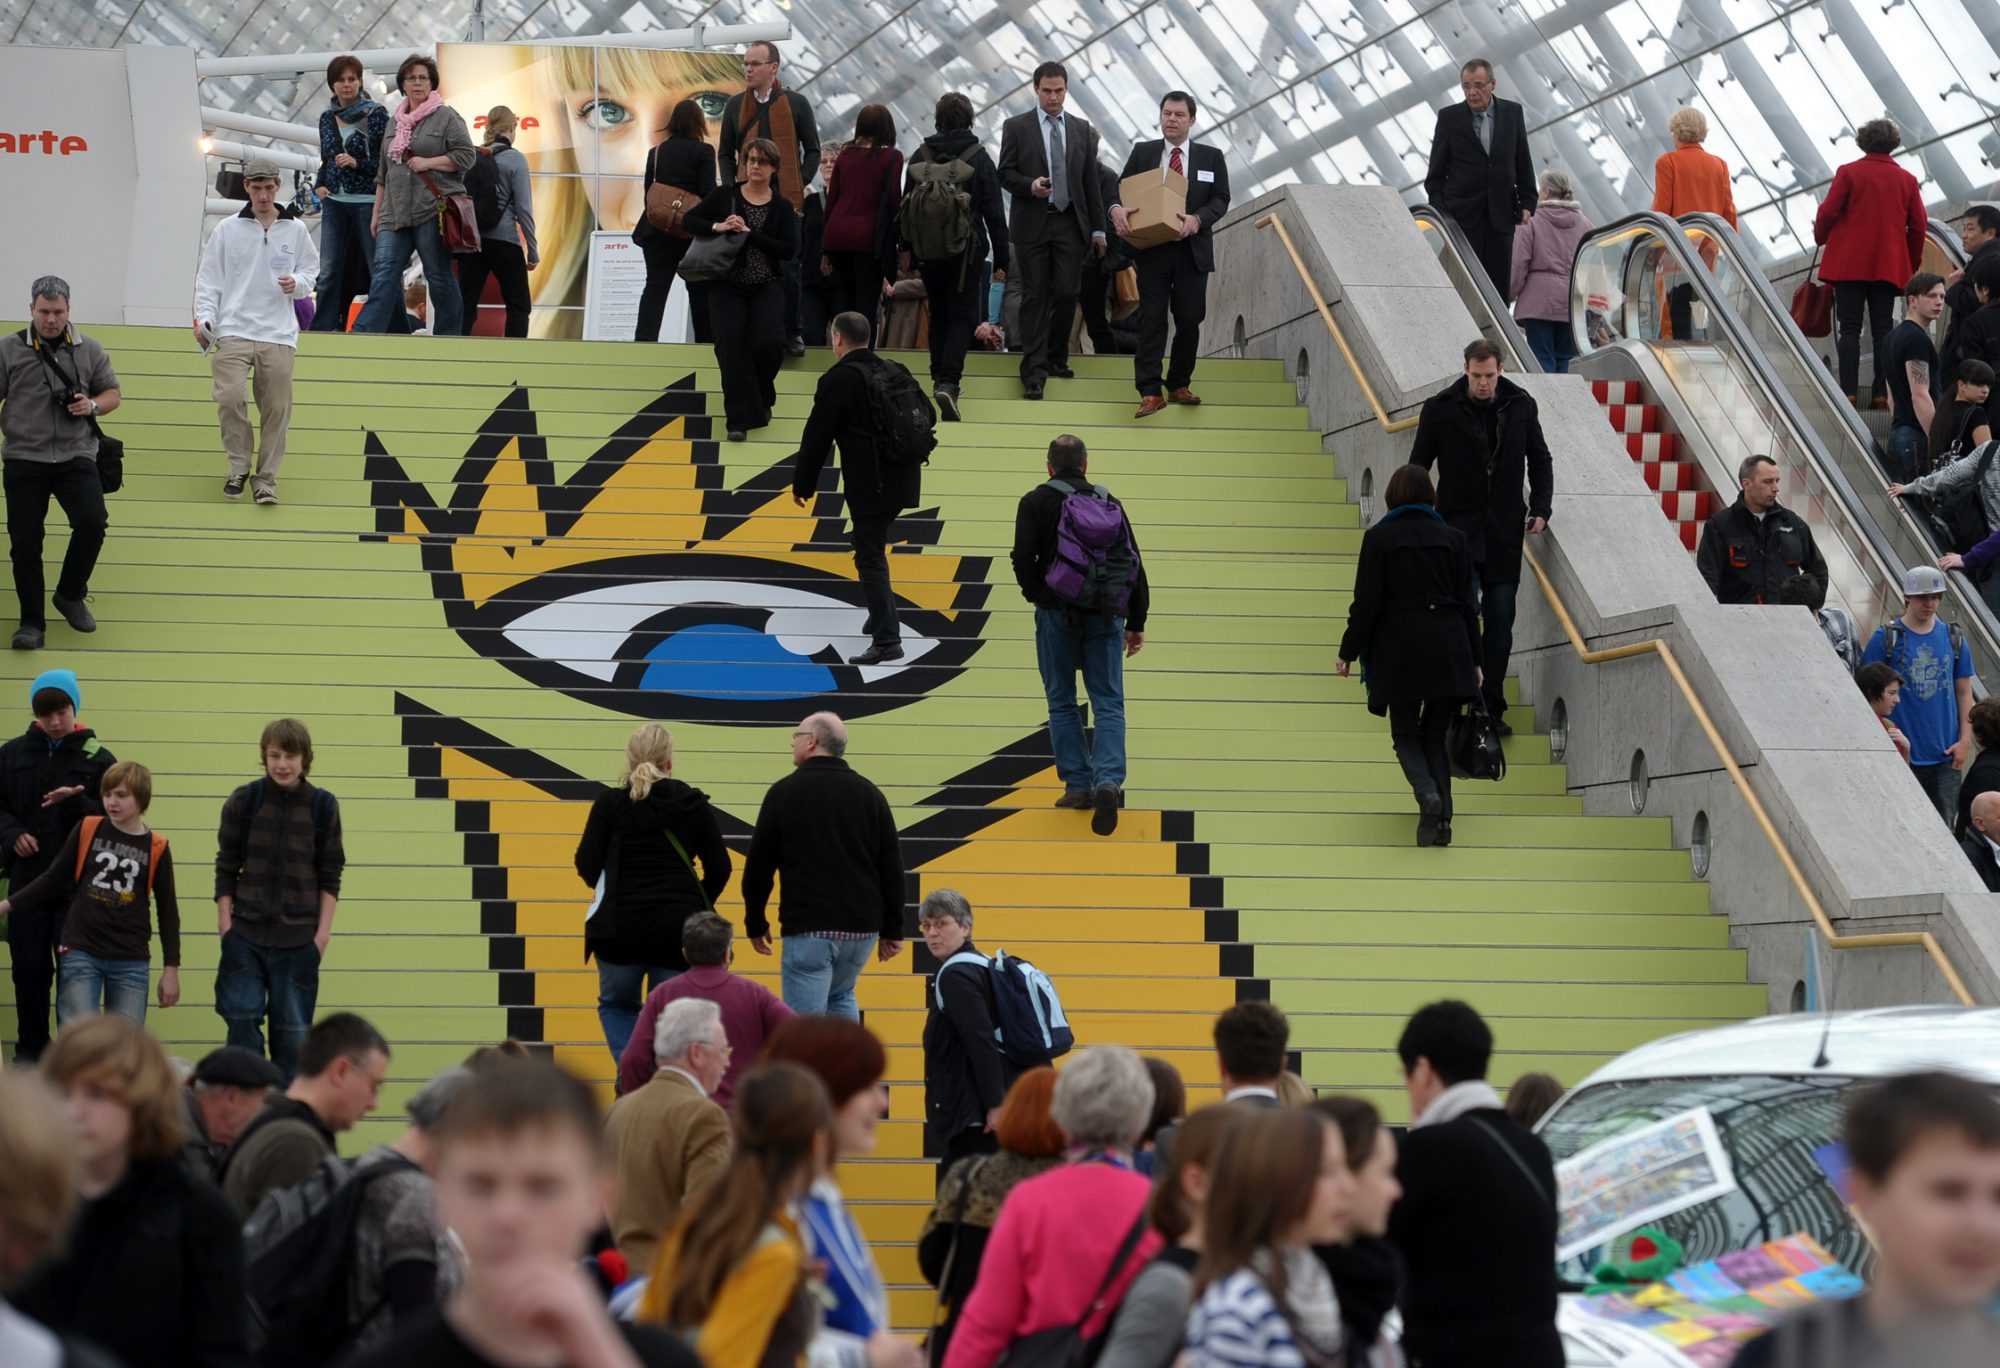 Leipziger Buchmesse 2012